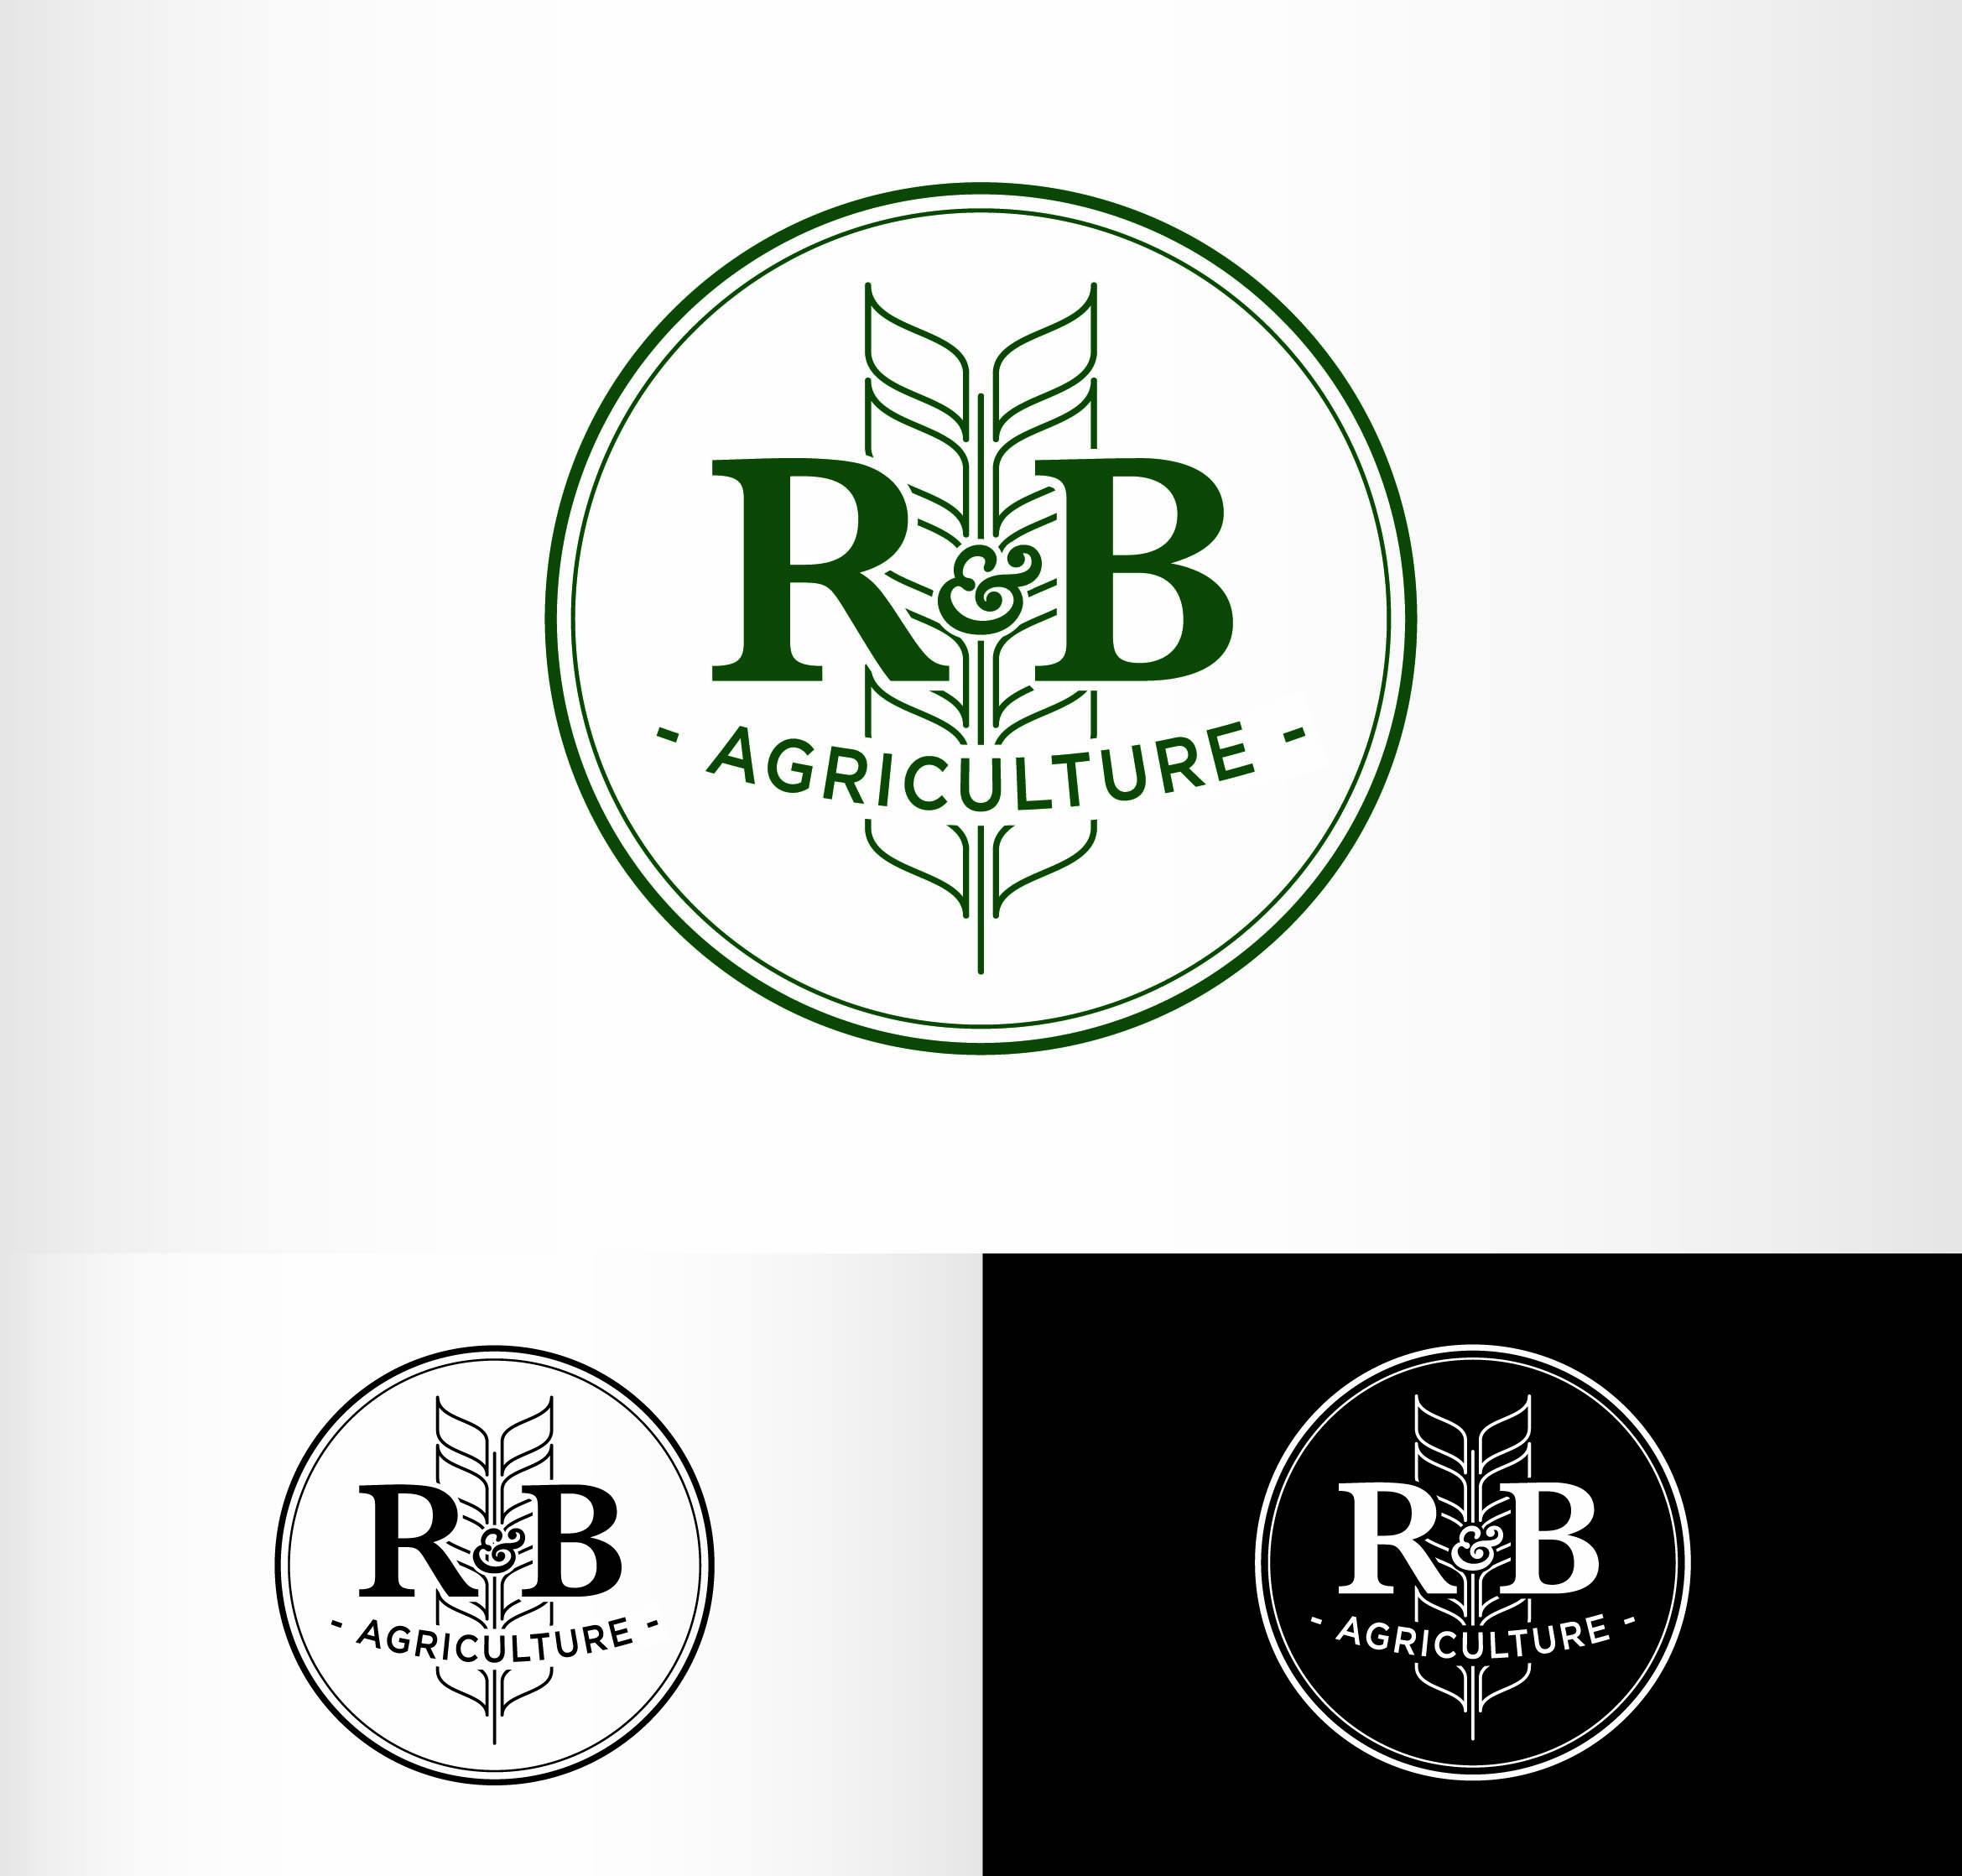 Logo Design by Andrés González - Entry No. 143 in the Logo Design Contest Captivating Logo Design for R & B Agriculture.